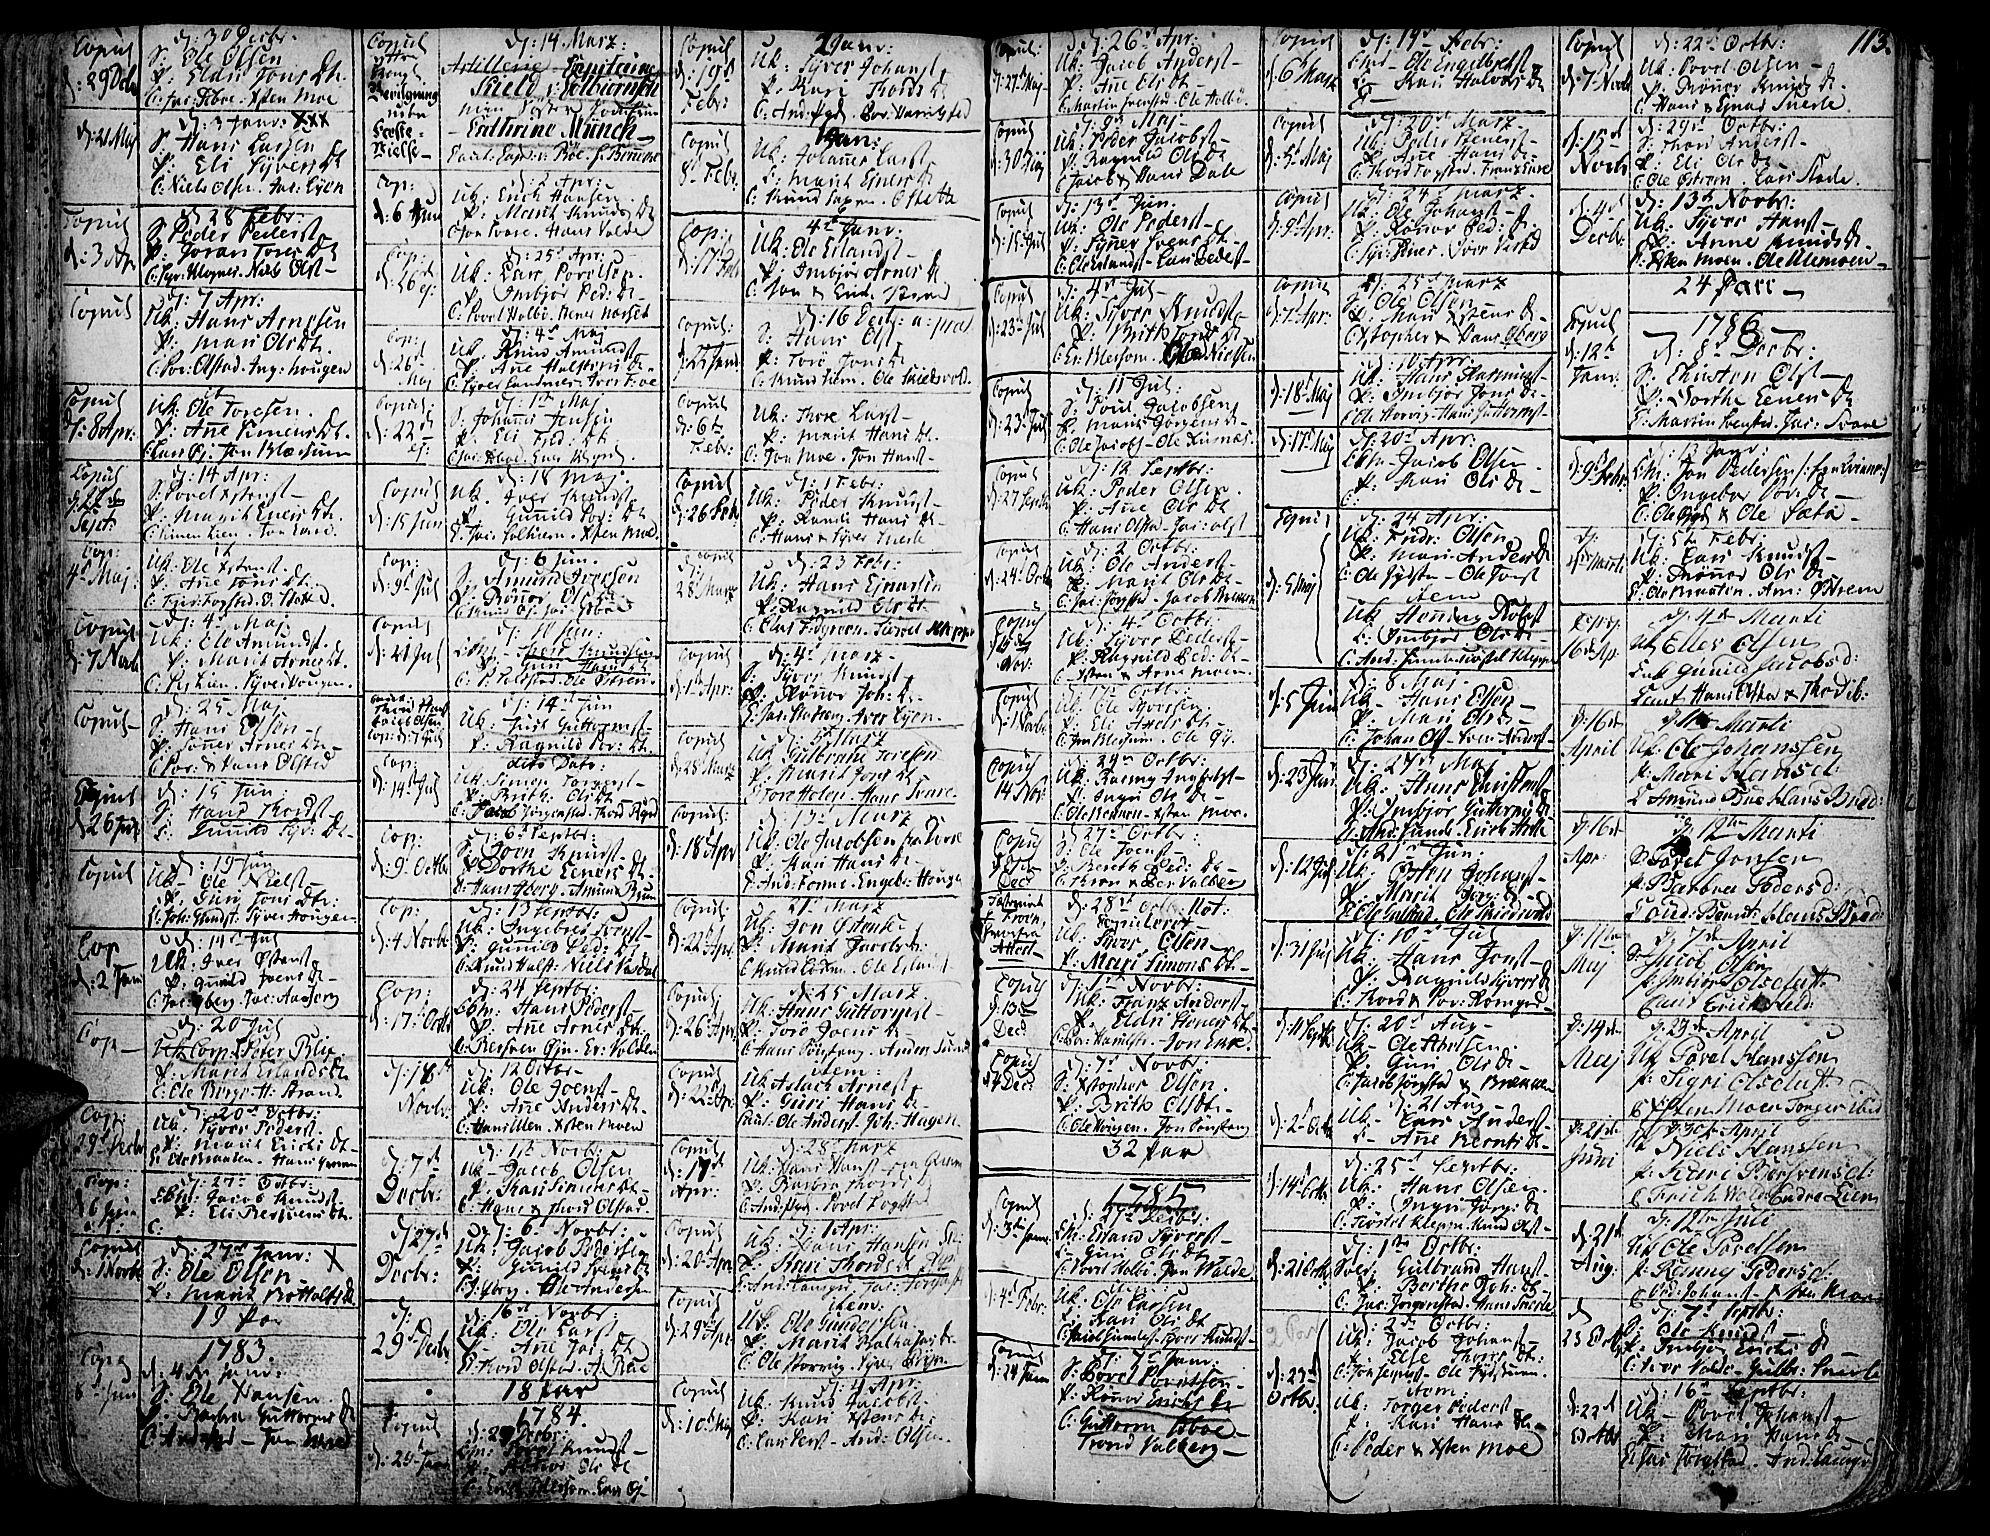 SAH, Vågå prestekontor, Ministerialbok nr. 1, 1739-1810, s. 113